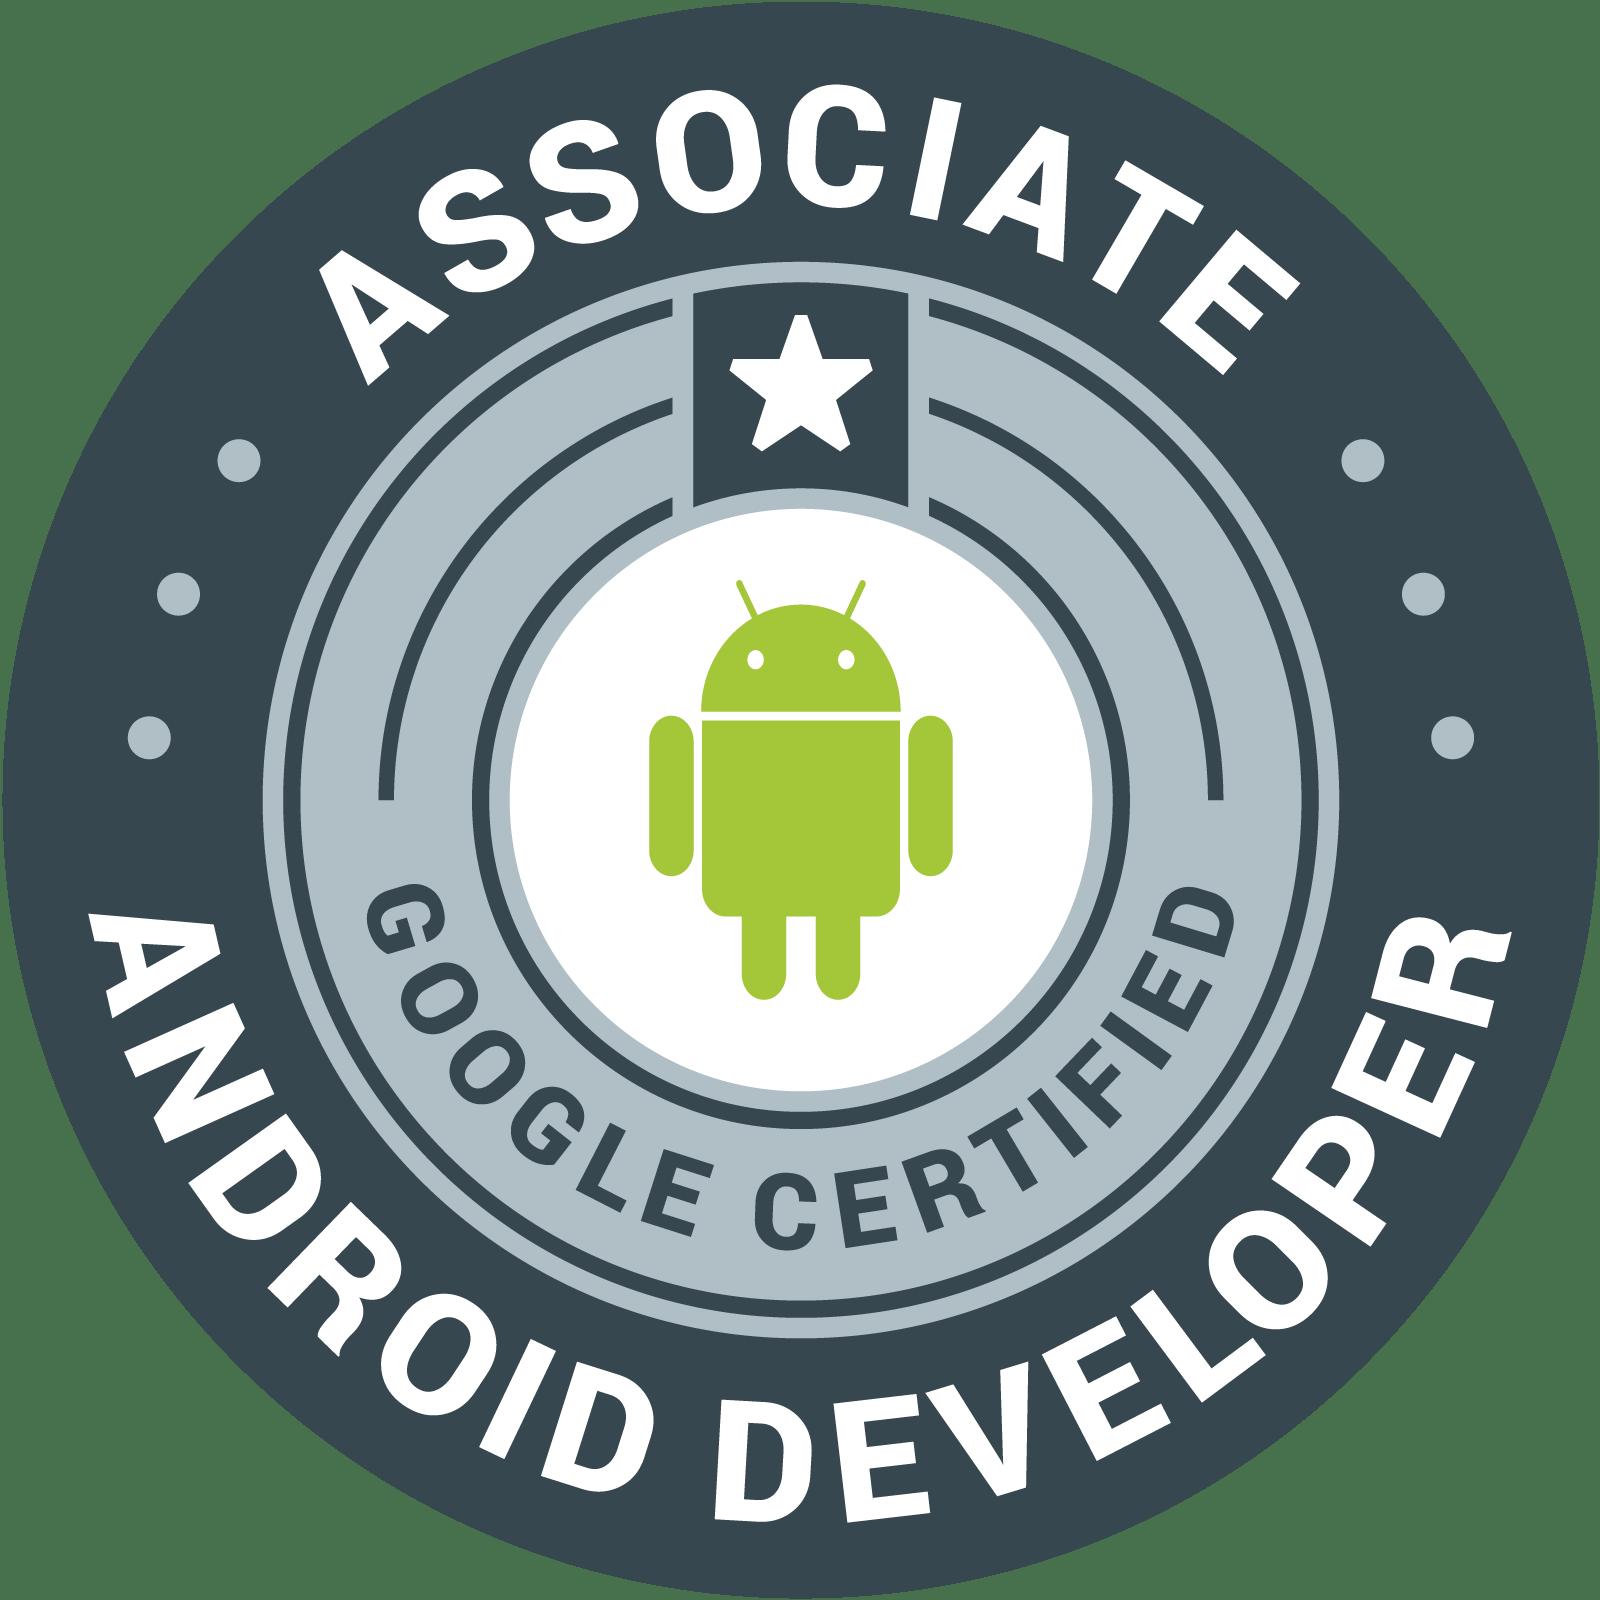 Associate Android Developer 認定資格 バッジ